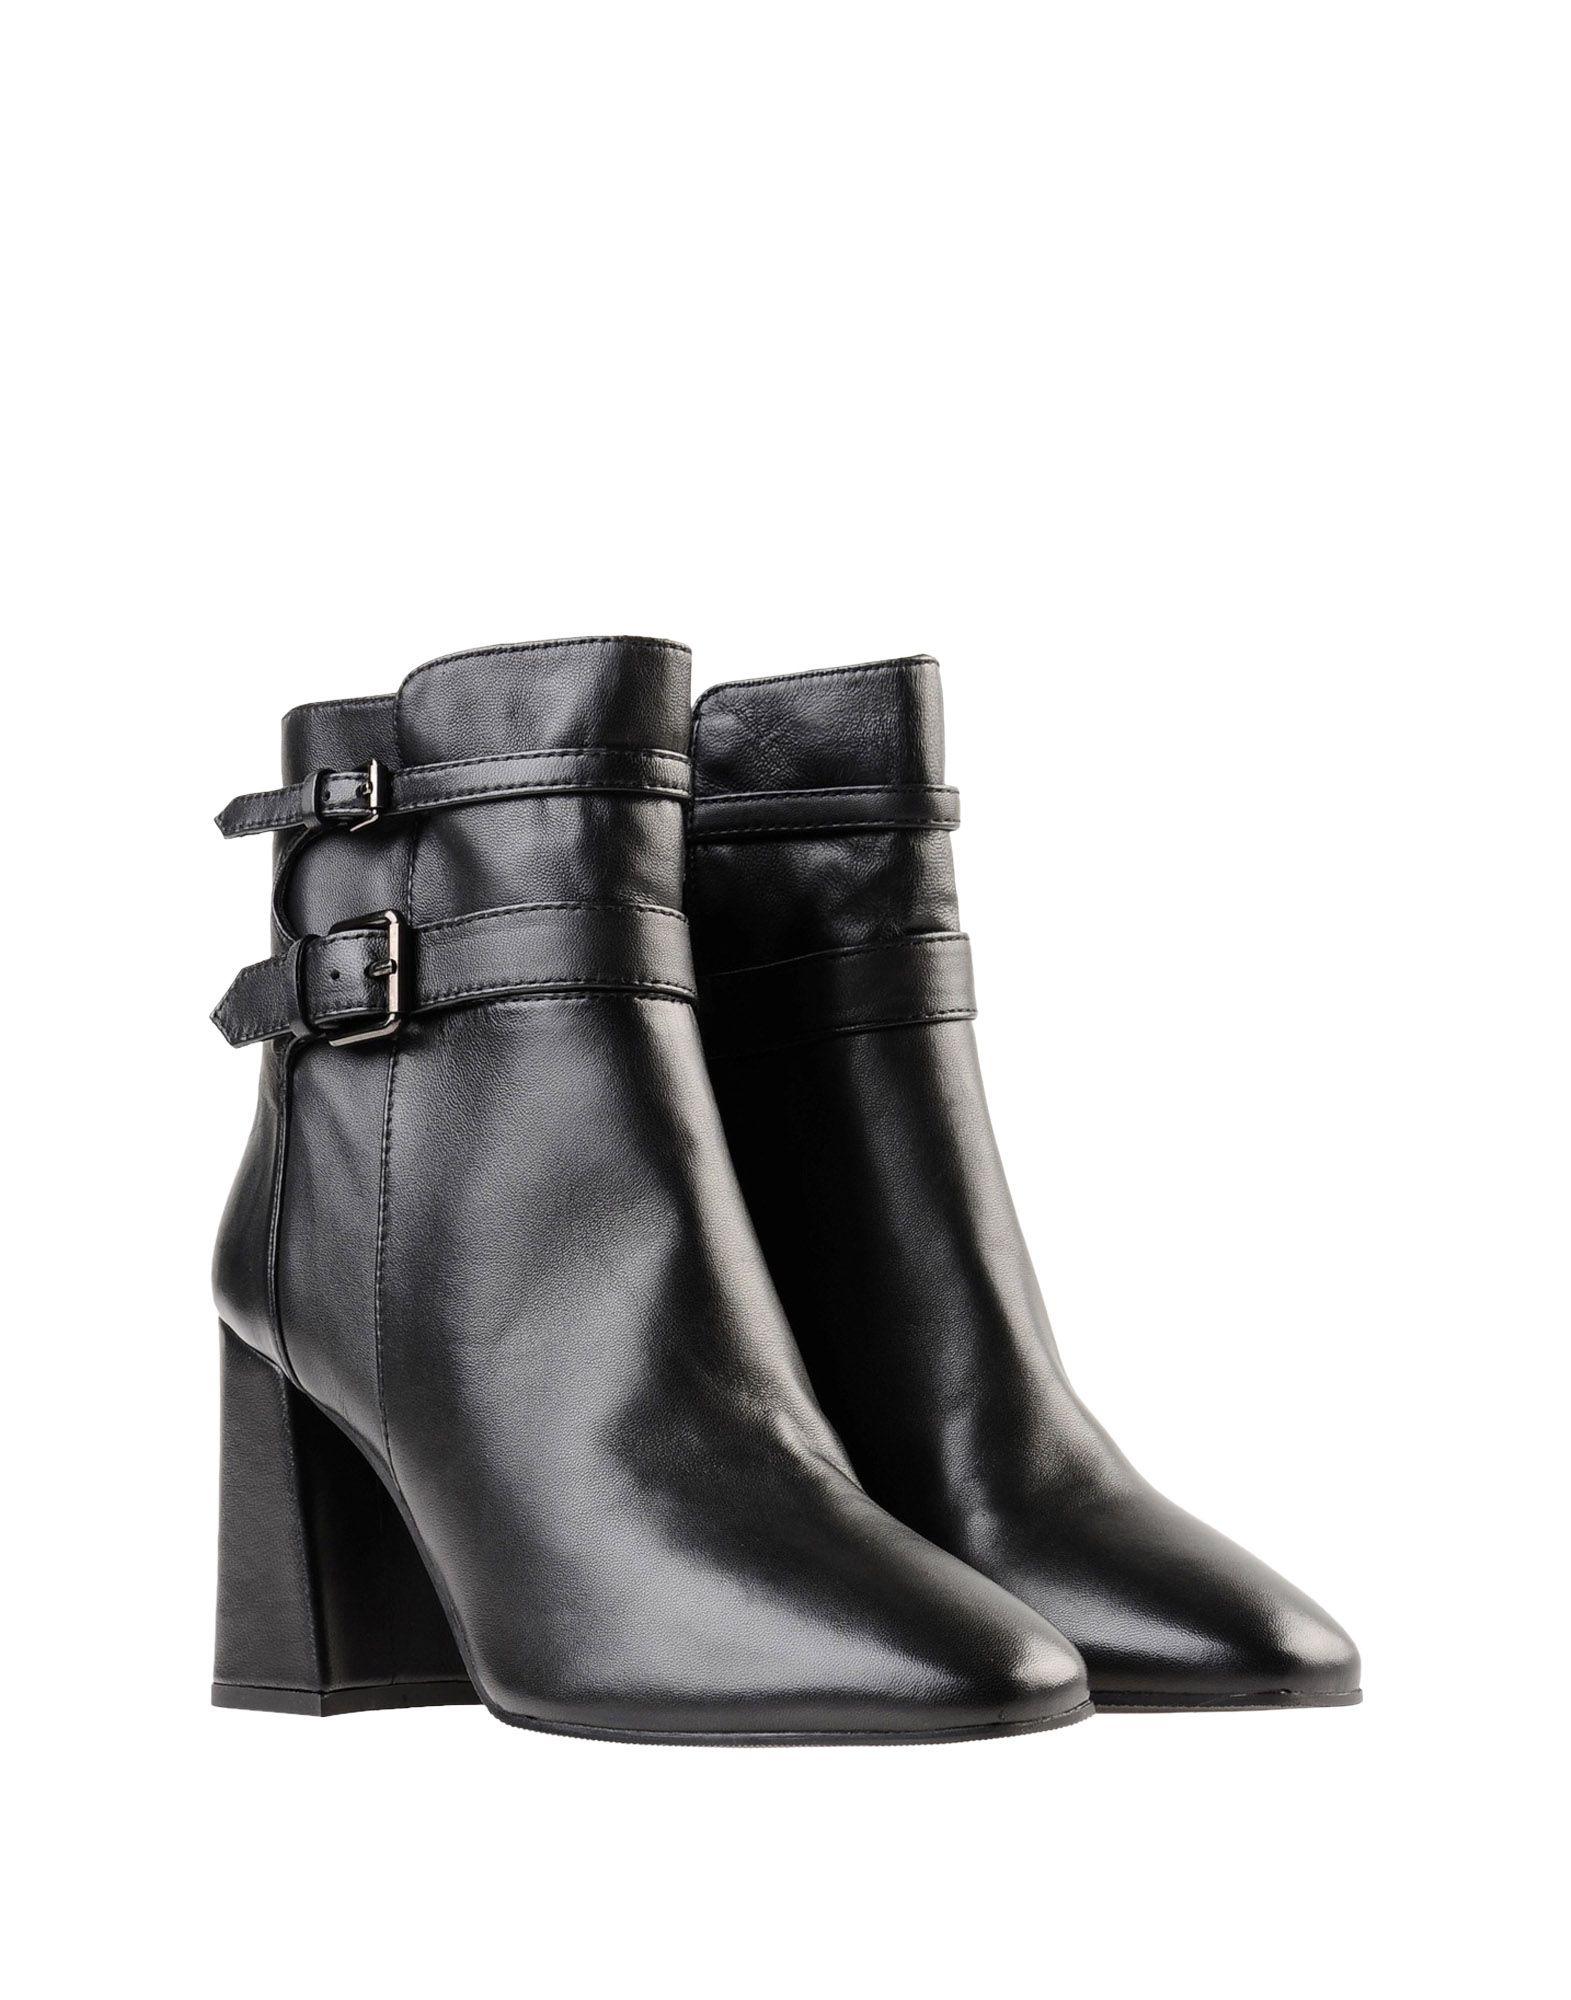 Stilvolle billige Stiefelette Schuhe Bruno Premi Stiefelette billige Damen  11533324LQ fa85cf